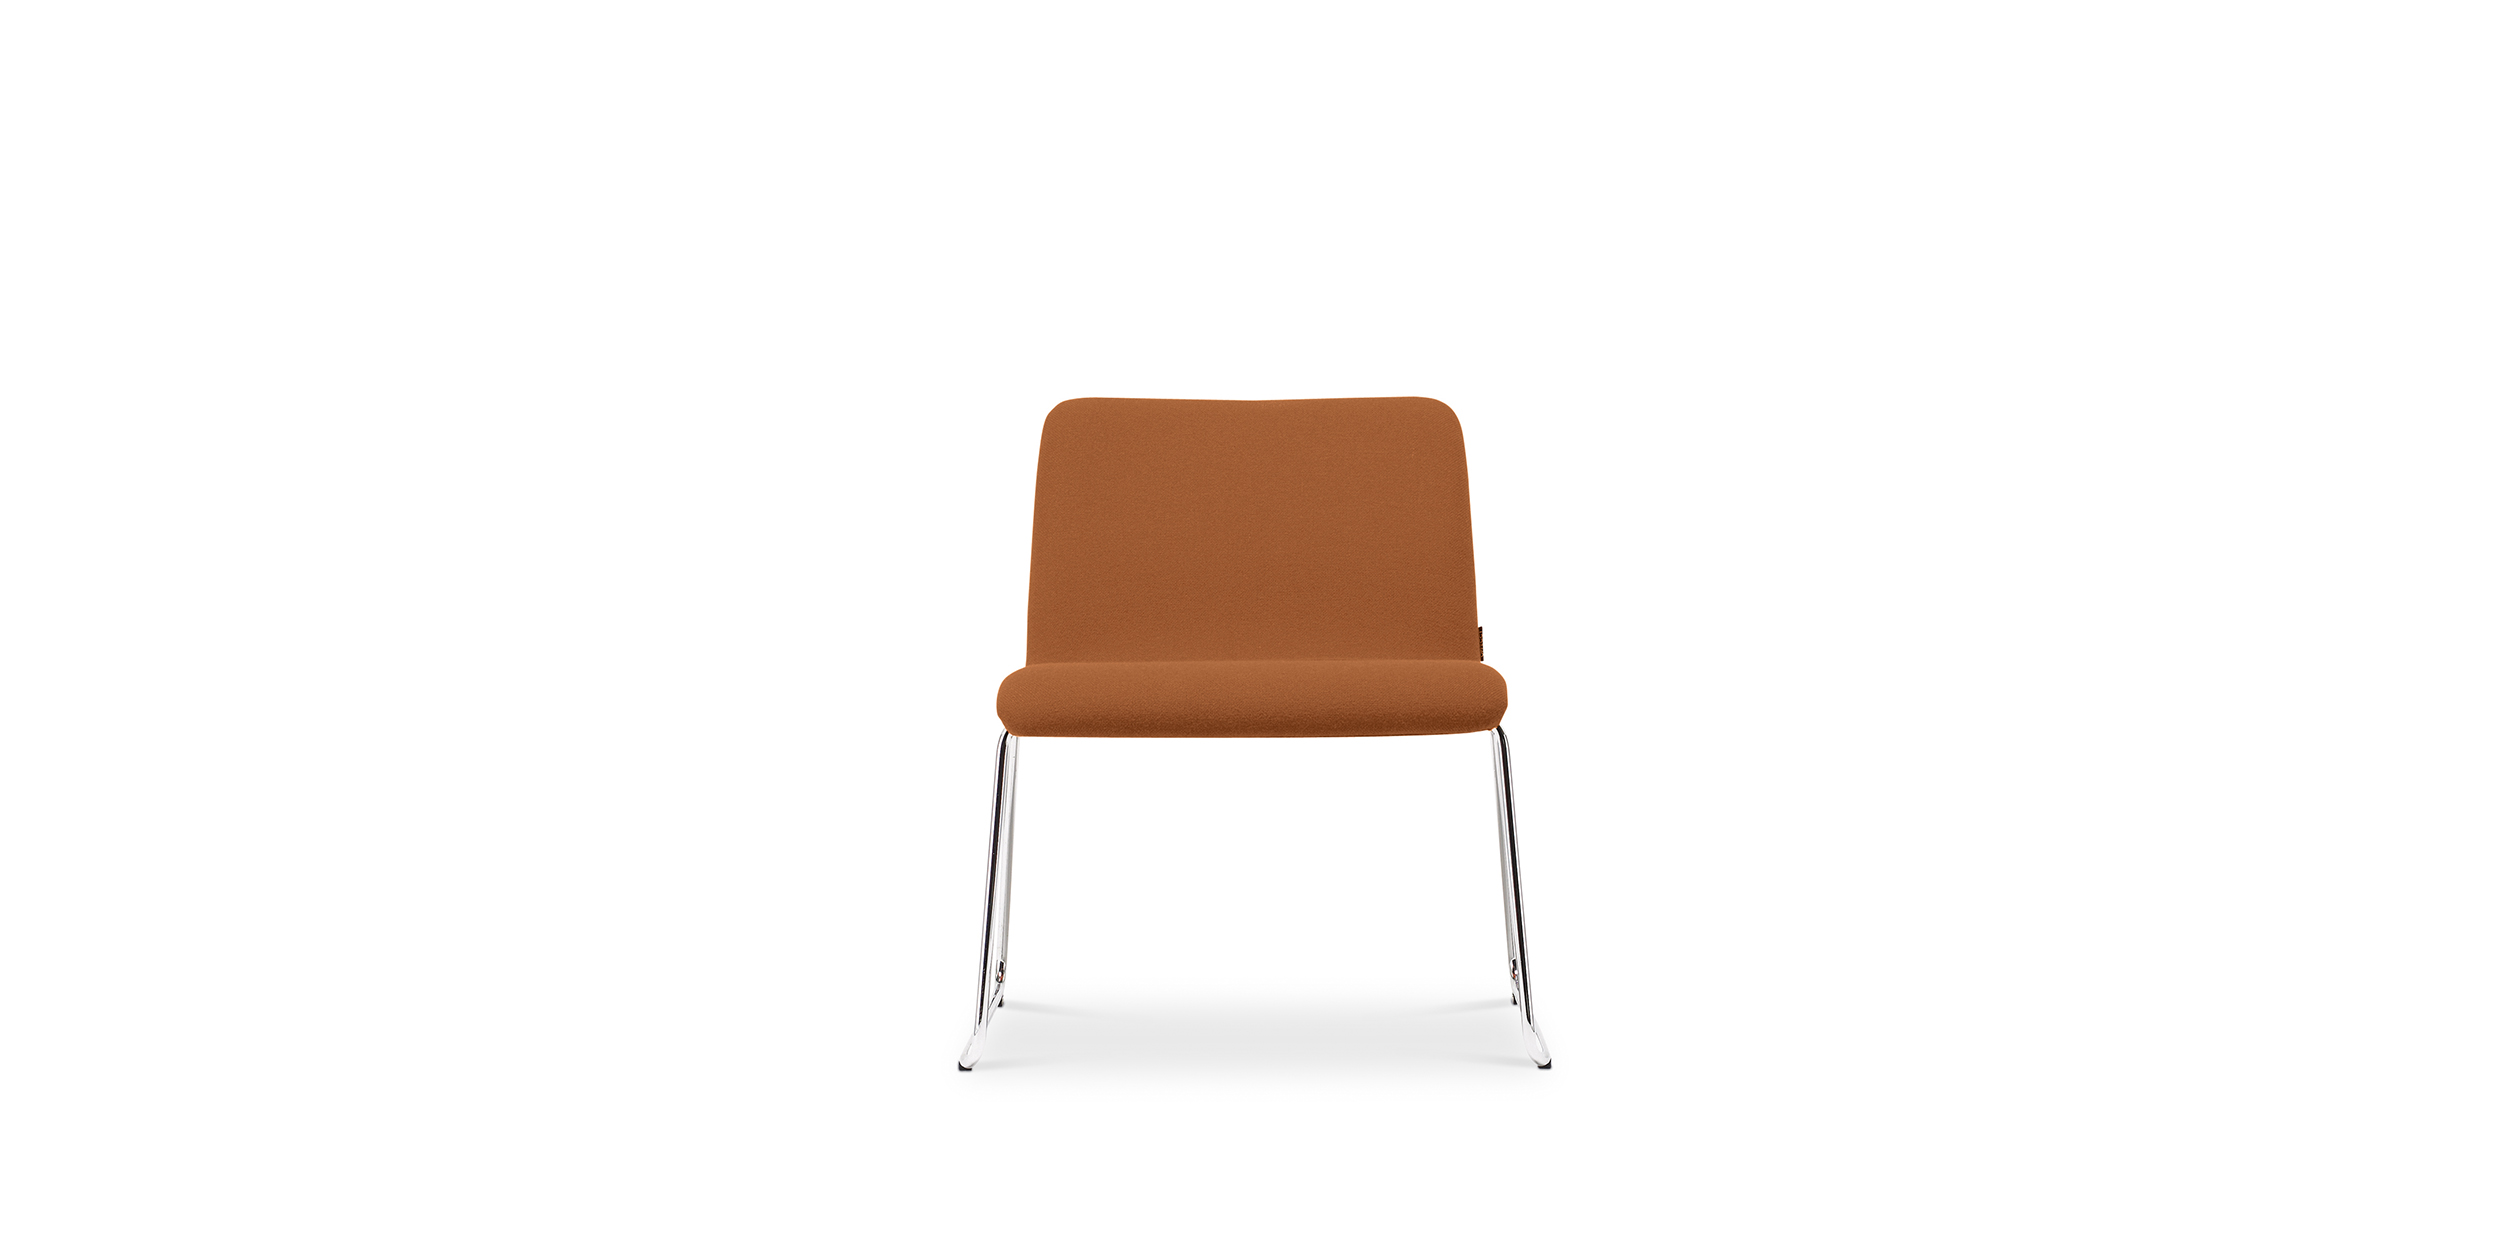 Mono Light, Stackable easy chair by Claesson Koivisto Rune